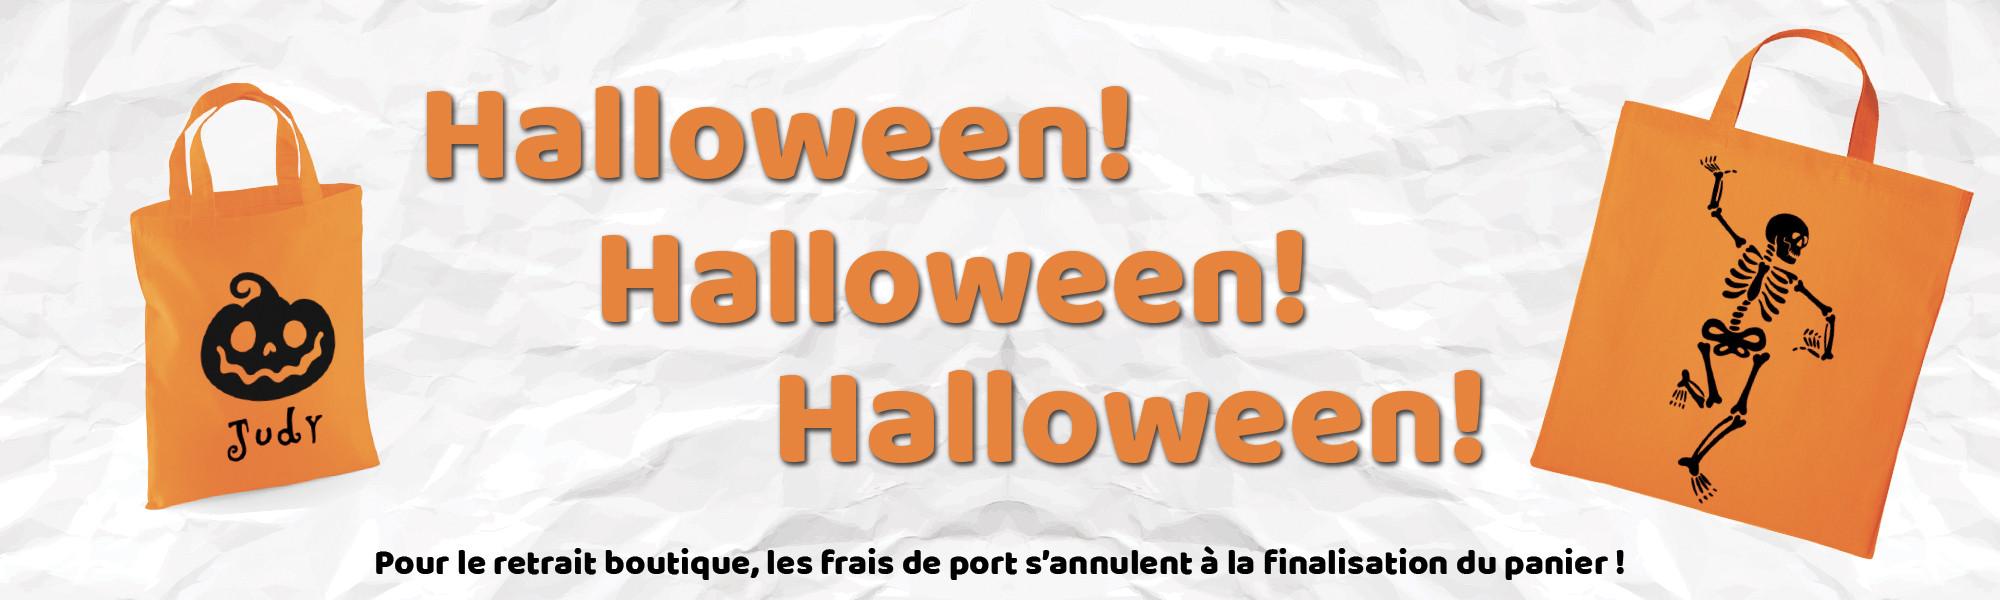 Bientôt Halloween, passez vos commandes !!!